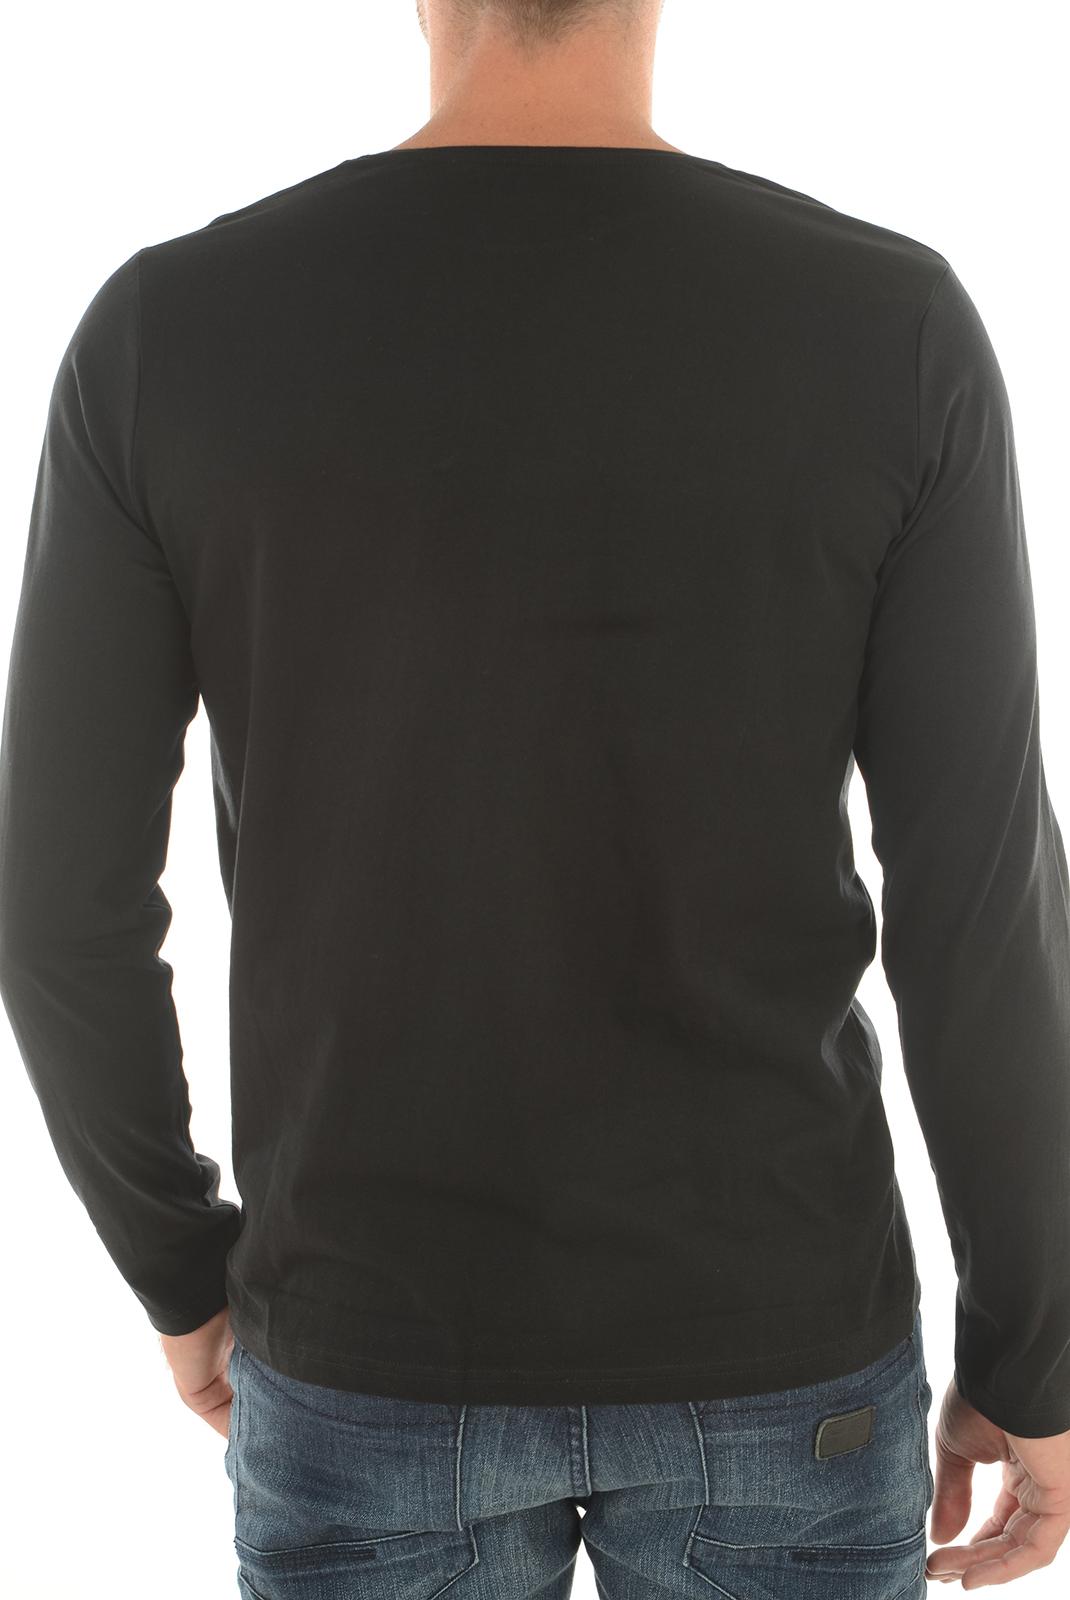 Tee-shirts  Biaggio jeans LEDANIL NOIR